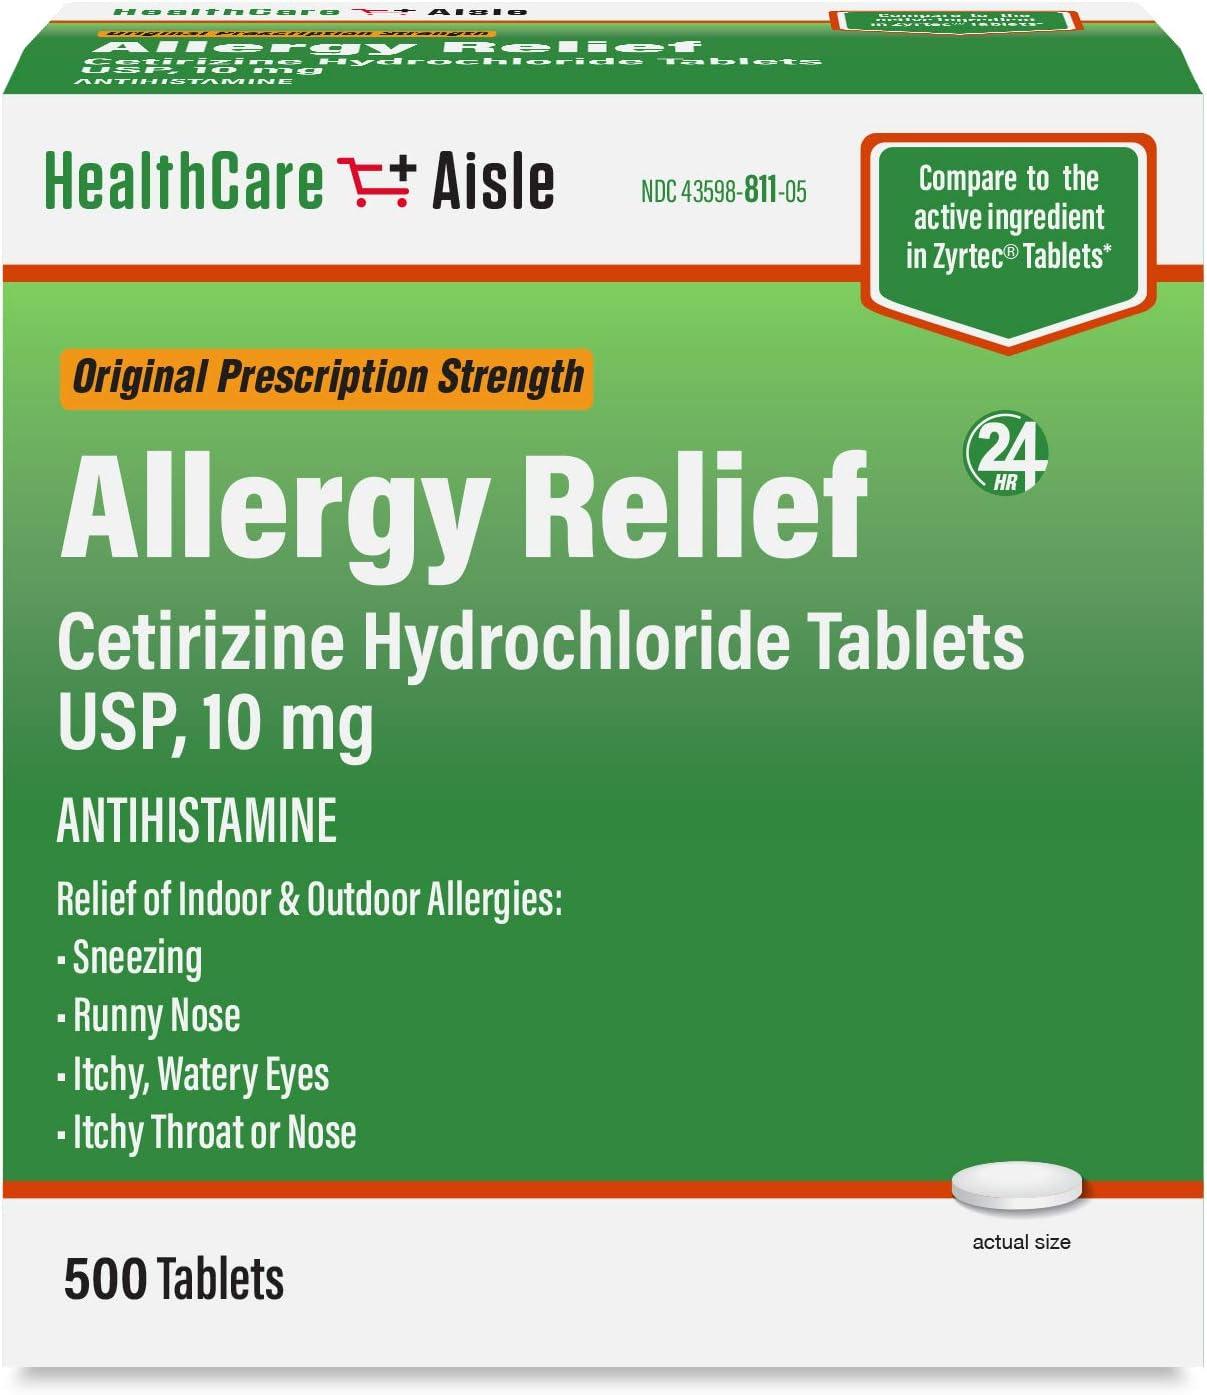 HealthCareAisle Allergy Relief Hydrochloride Popular popular Cetirizine Tablets Minneapolis Mall